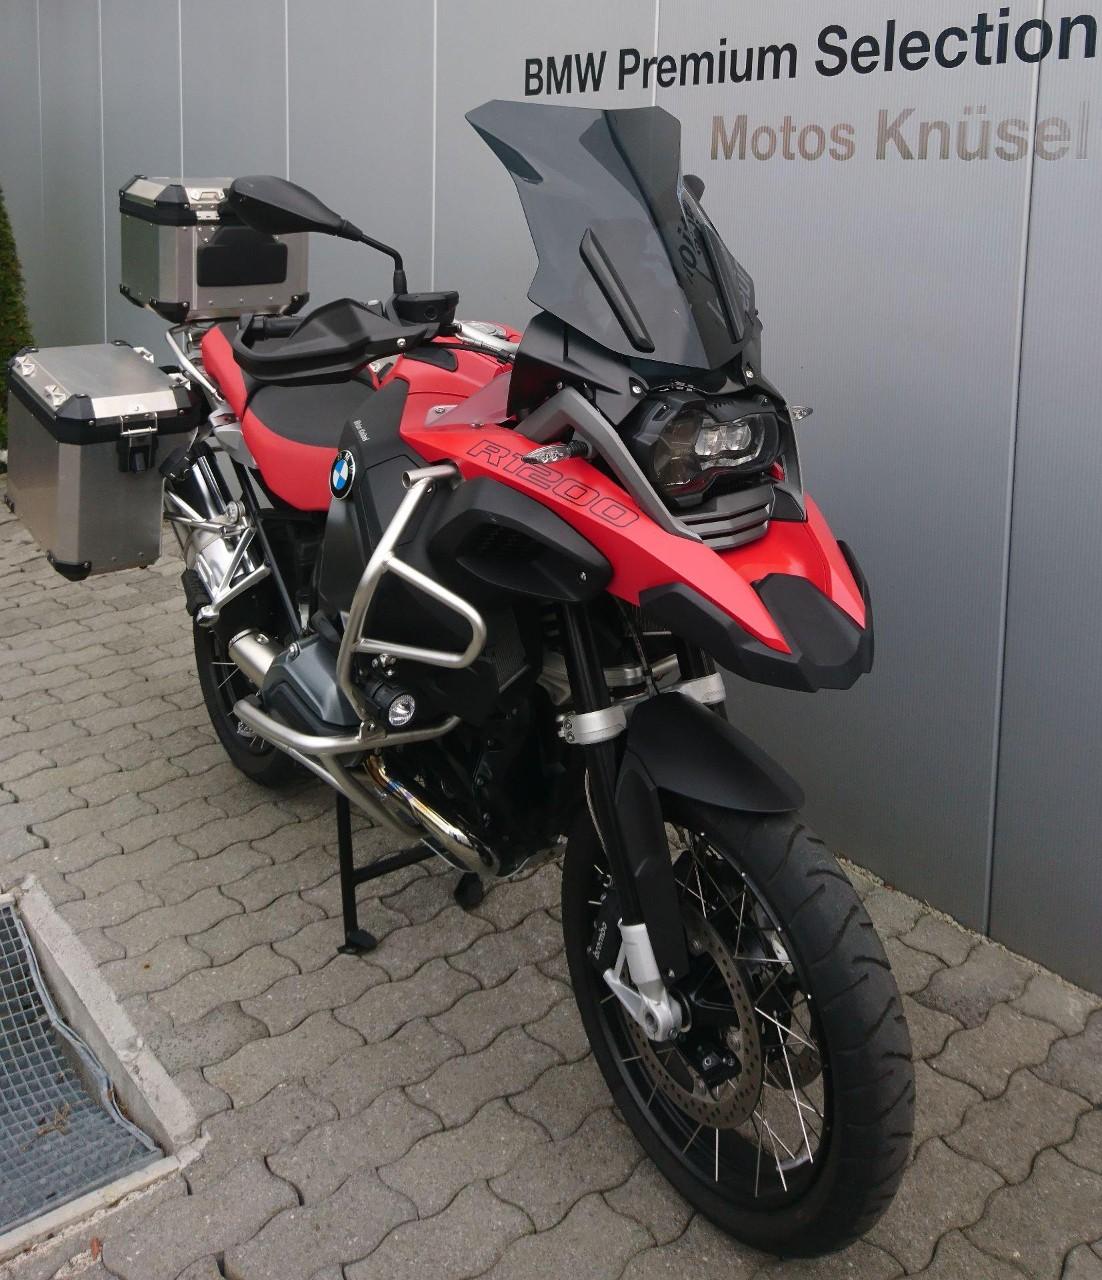 motorrad occasion kaufen bmw r 1200 gs adventure abs motos kn sel gmbh ebnet entlebuch. Black Bedroom Furniture Sets. Home Design Ideas